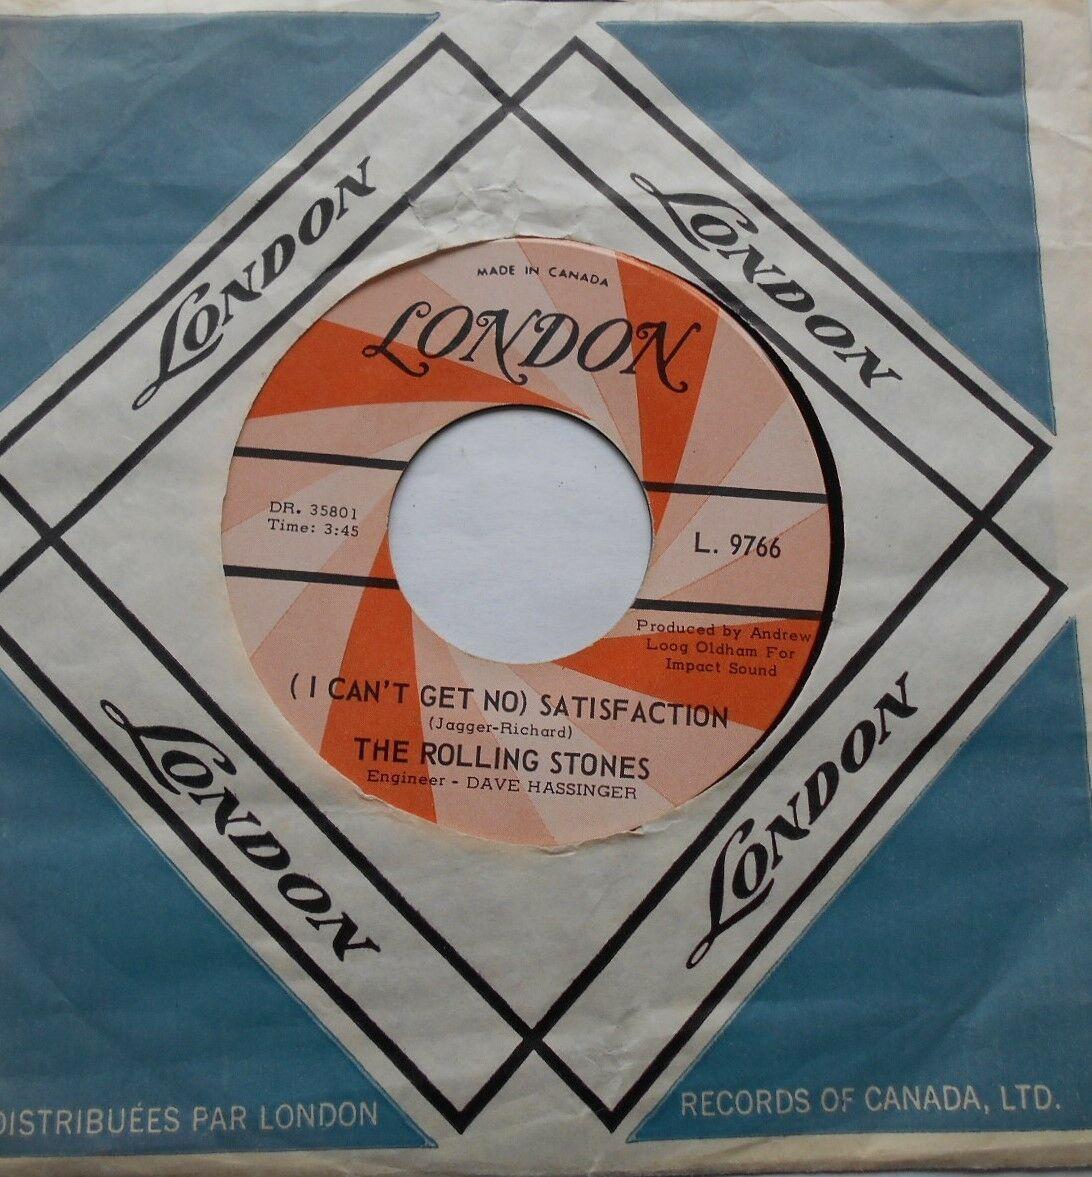 THE ROLLING STONES Satisfaction Ex to NM- CANADA 1965 ORANGE SWIRL 45 LONDON